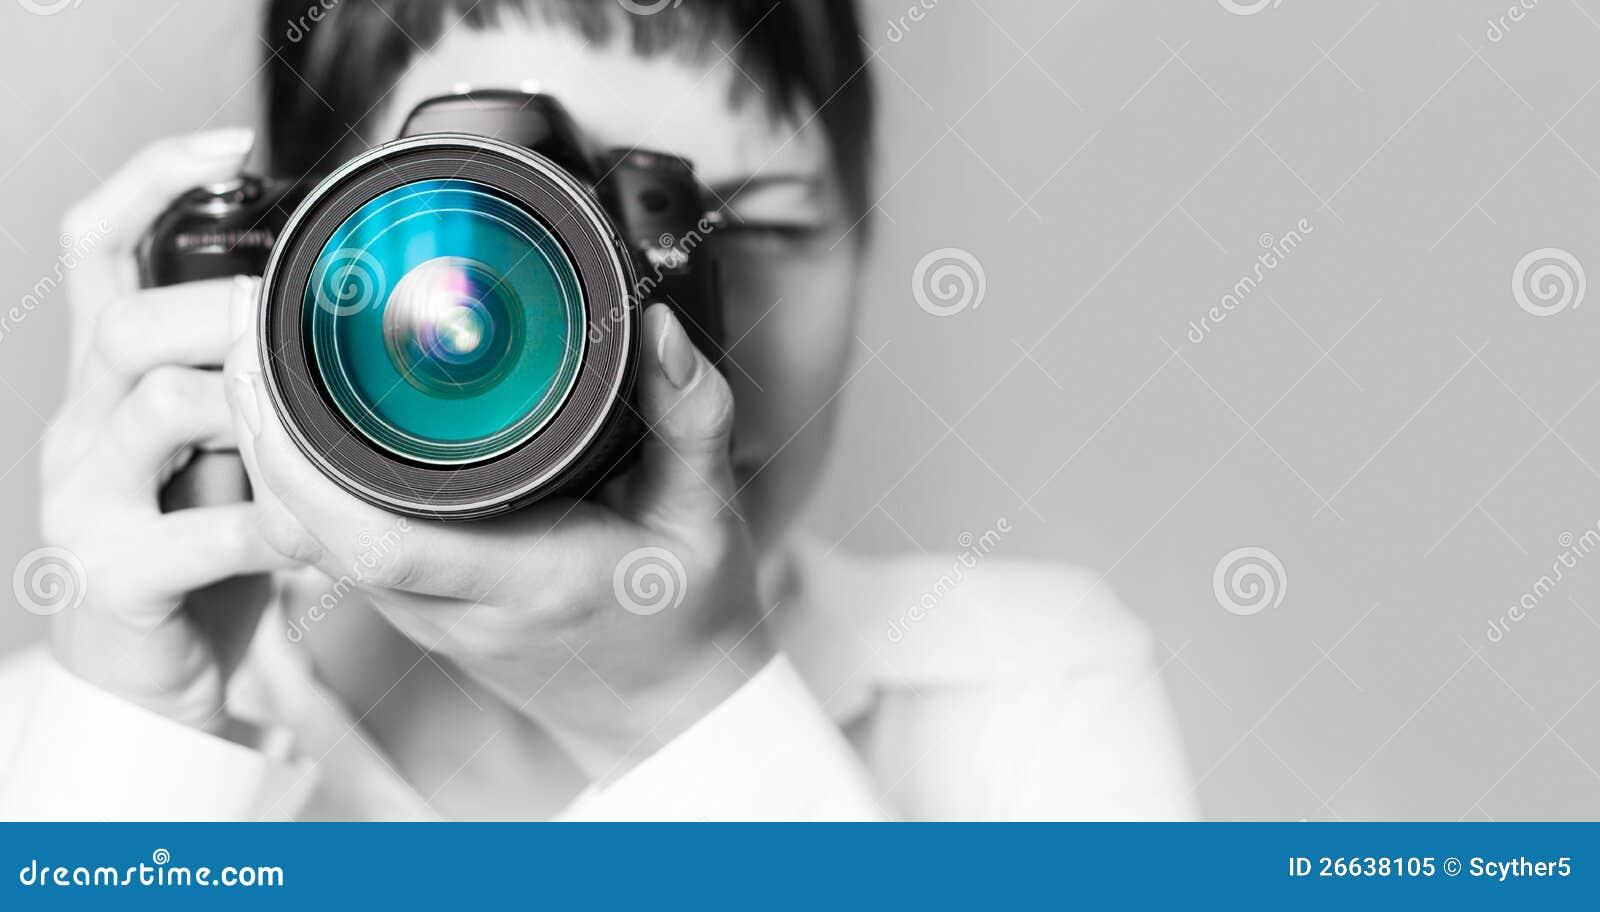 Frauenphotograph mit Kamera